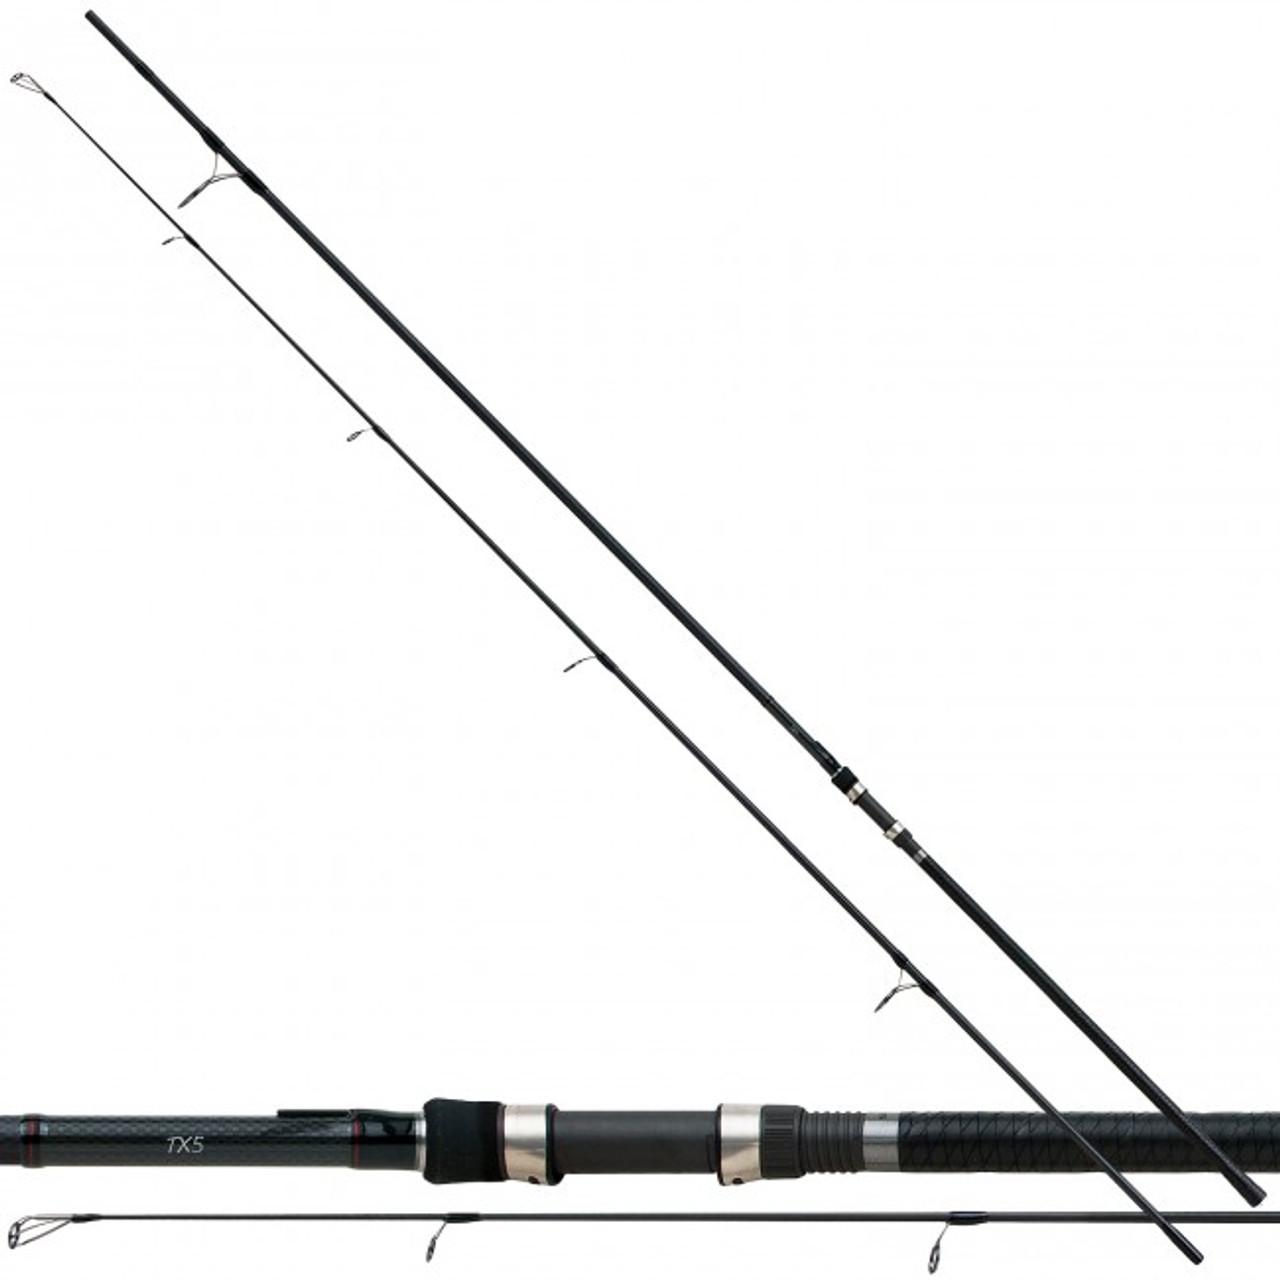 Shimano Tribal TX5 Carp Rod 12ft 2.75lb